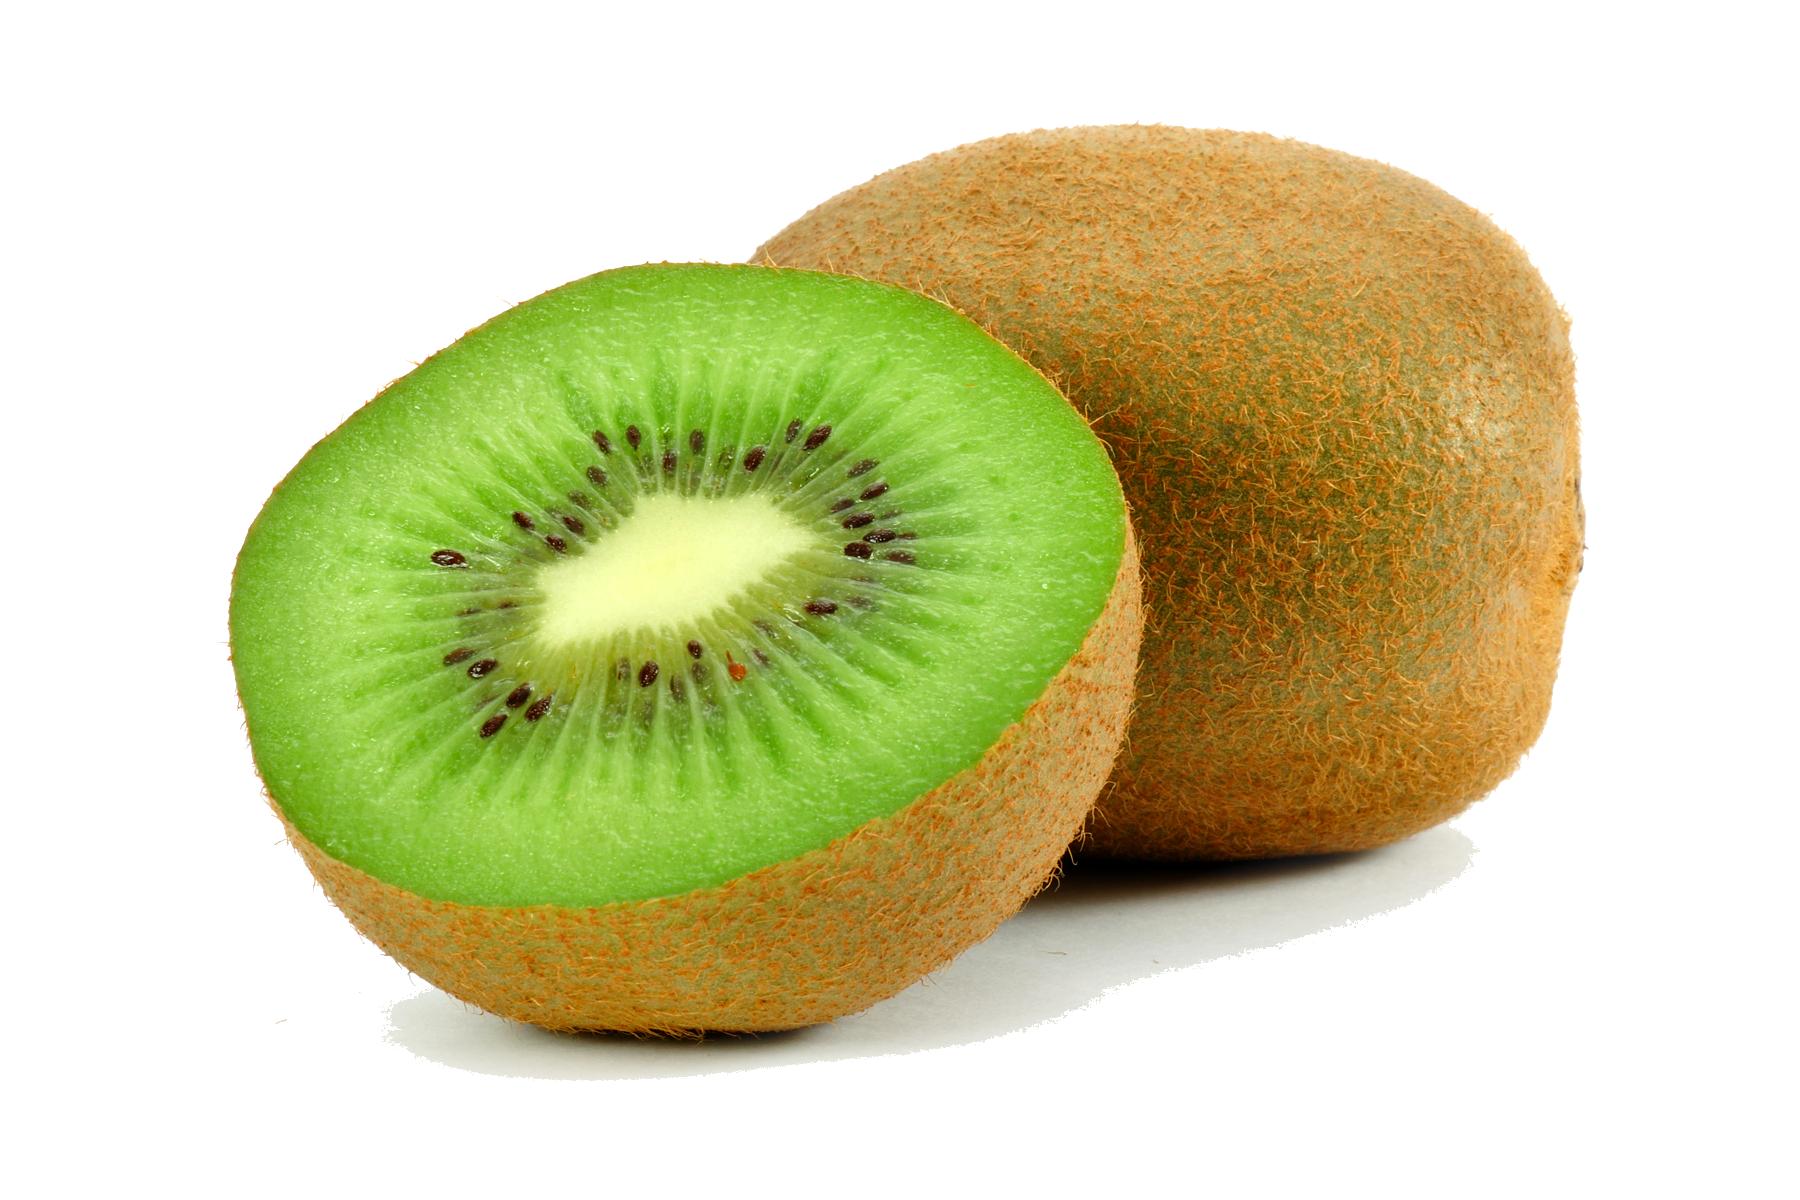 Png transparent image mart. Kiwi clipart green fruit